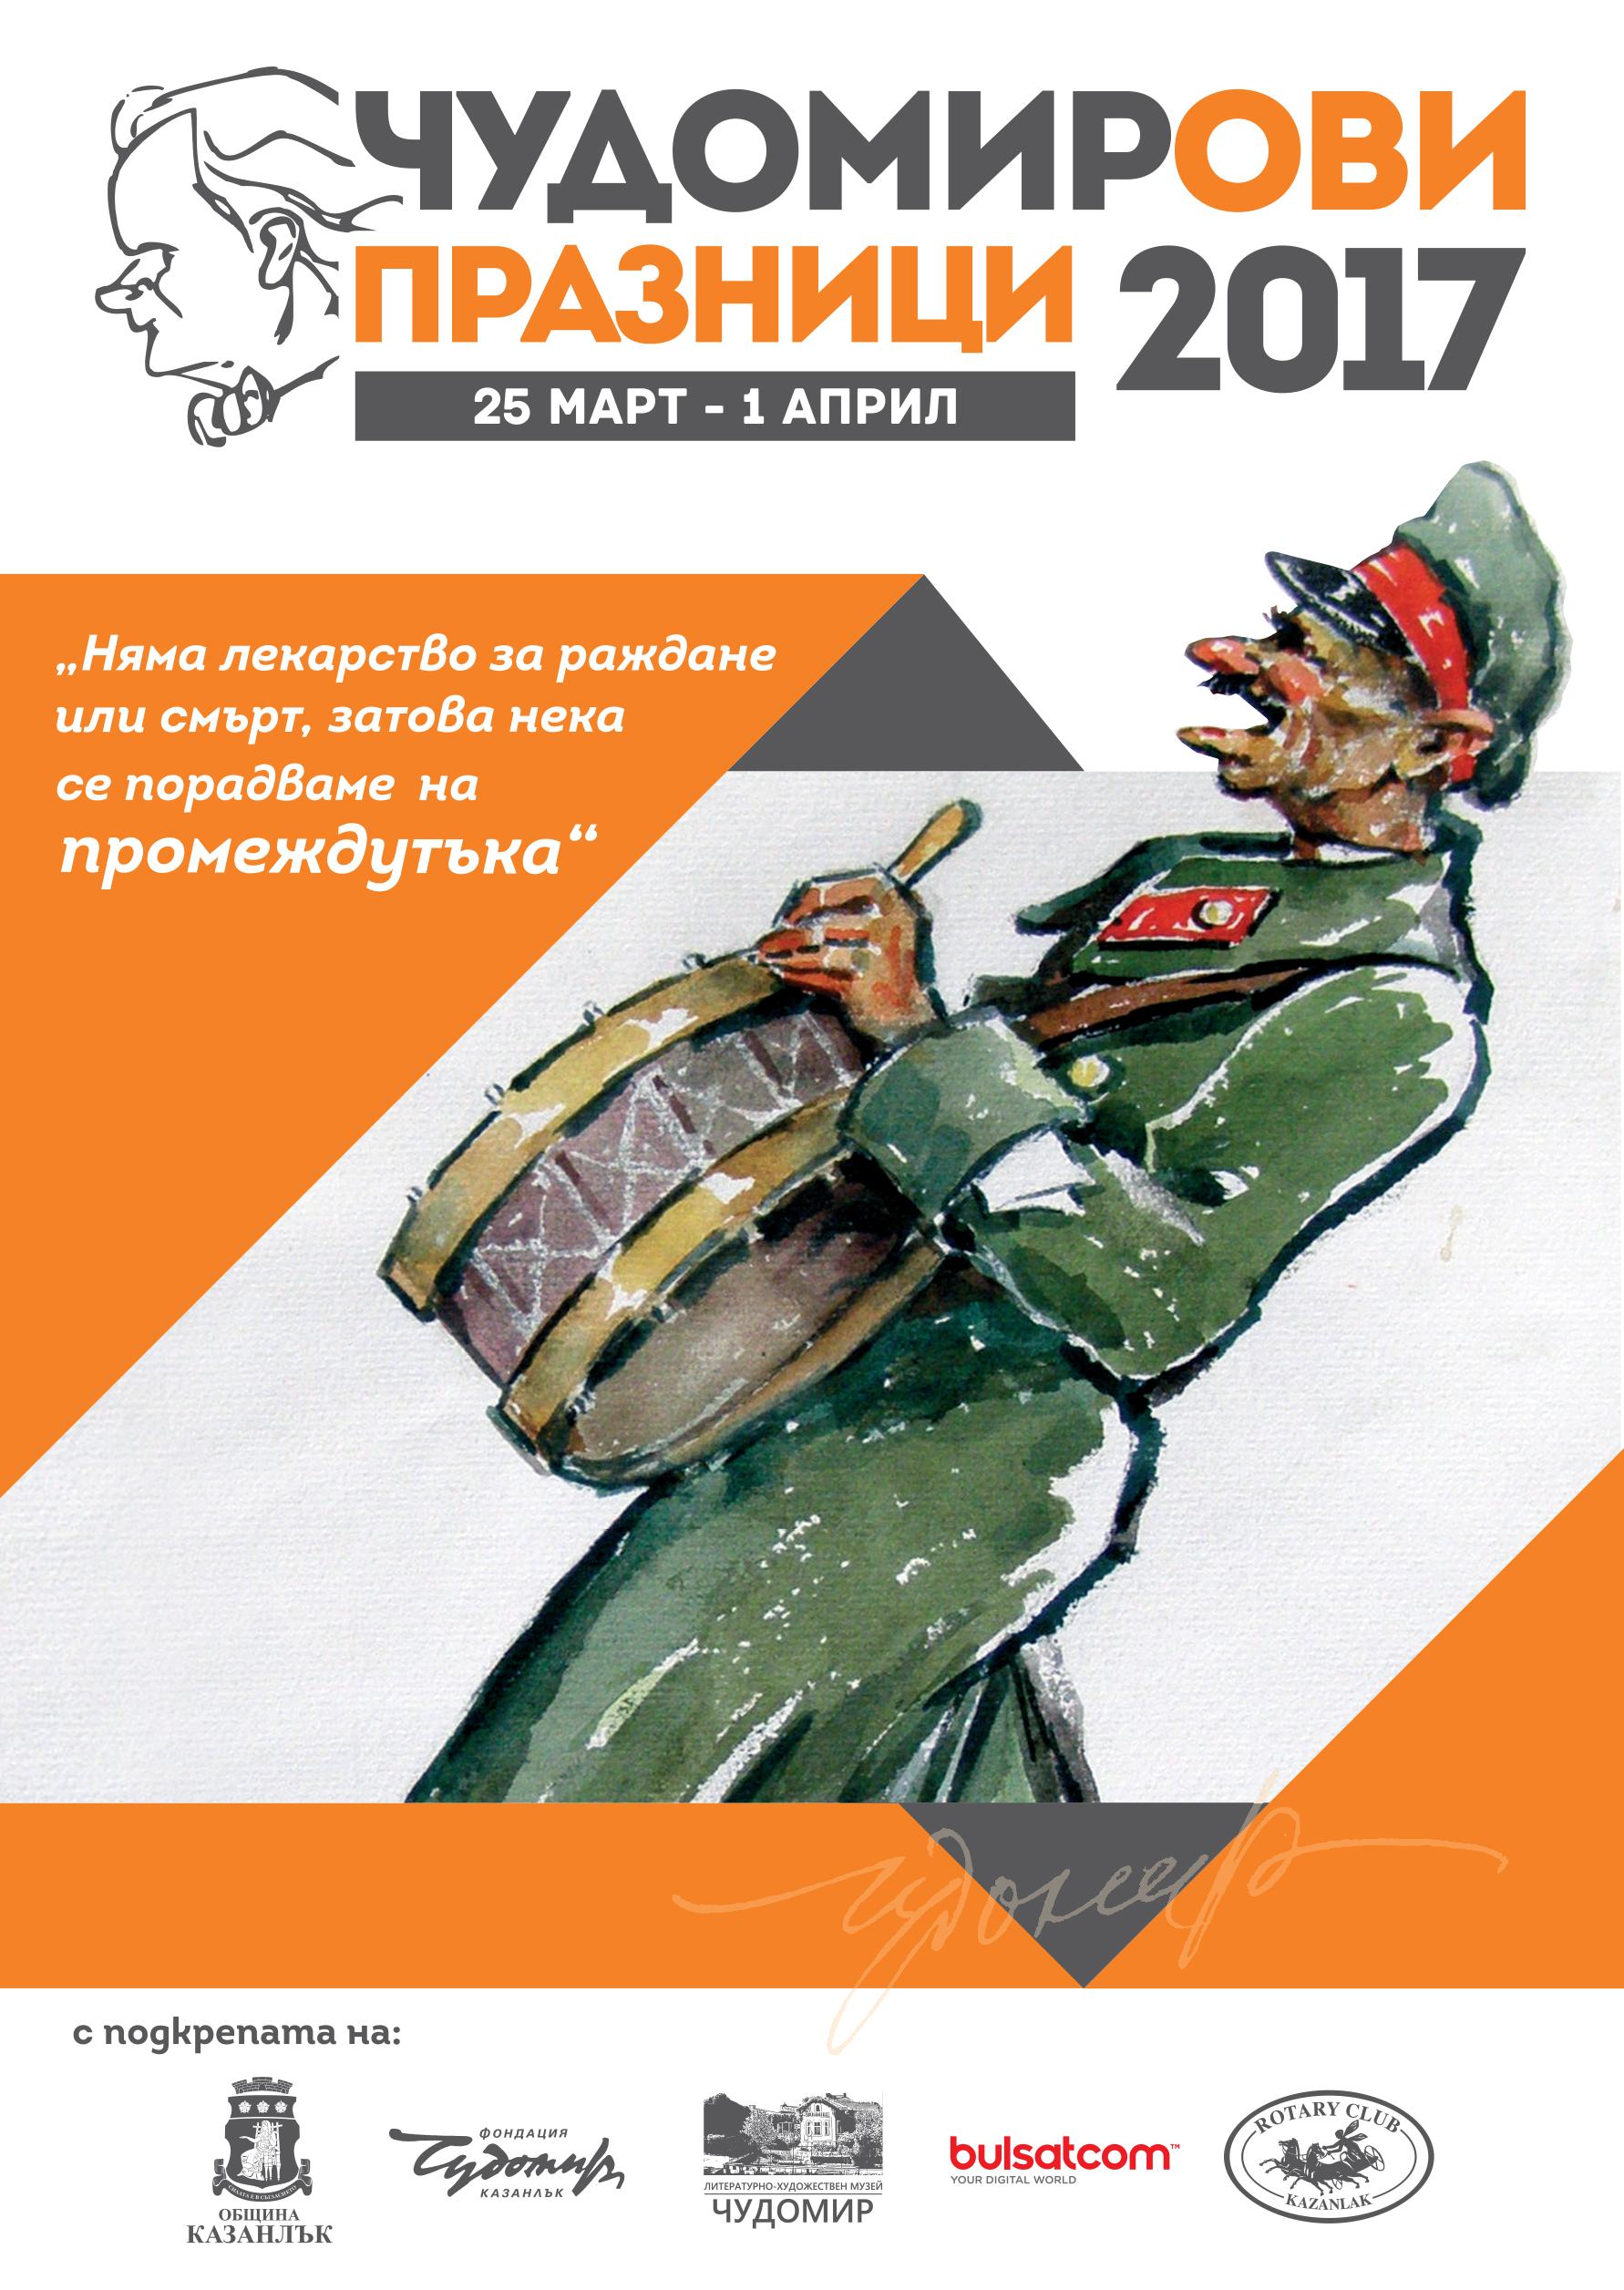 Програма Чудомирови празници 2017